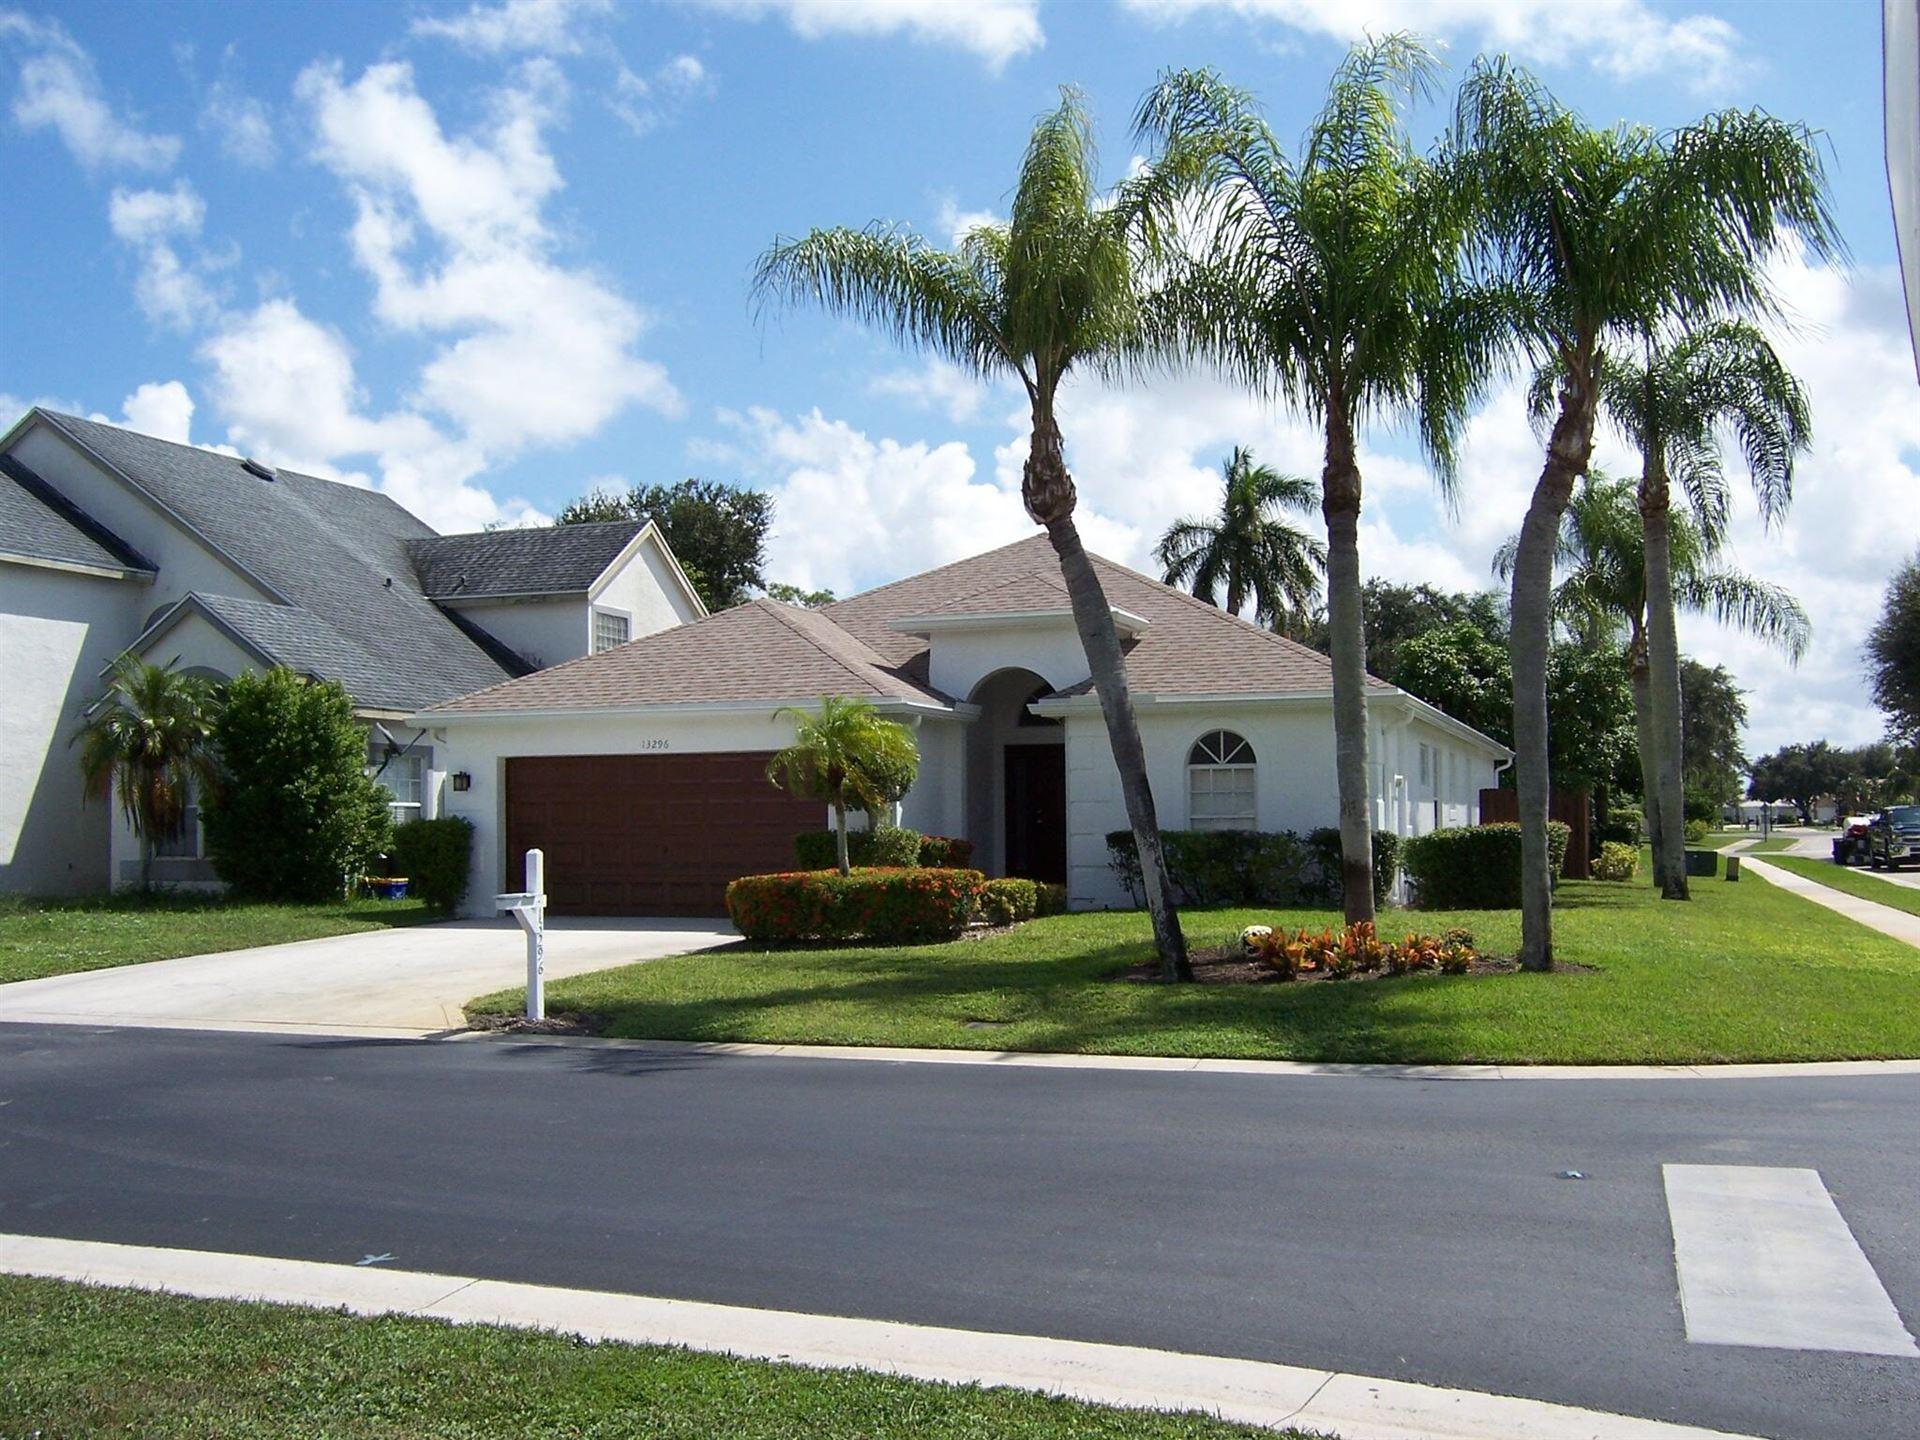 13296 Emerald View Court, Wellington, FL 33414 - MLS#: RX-10750351